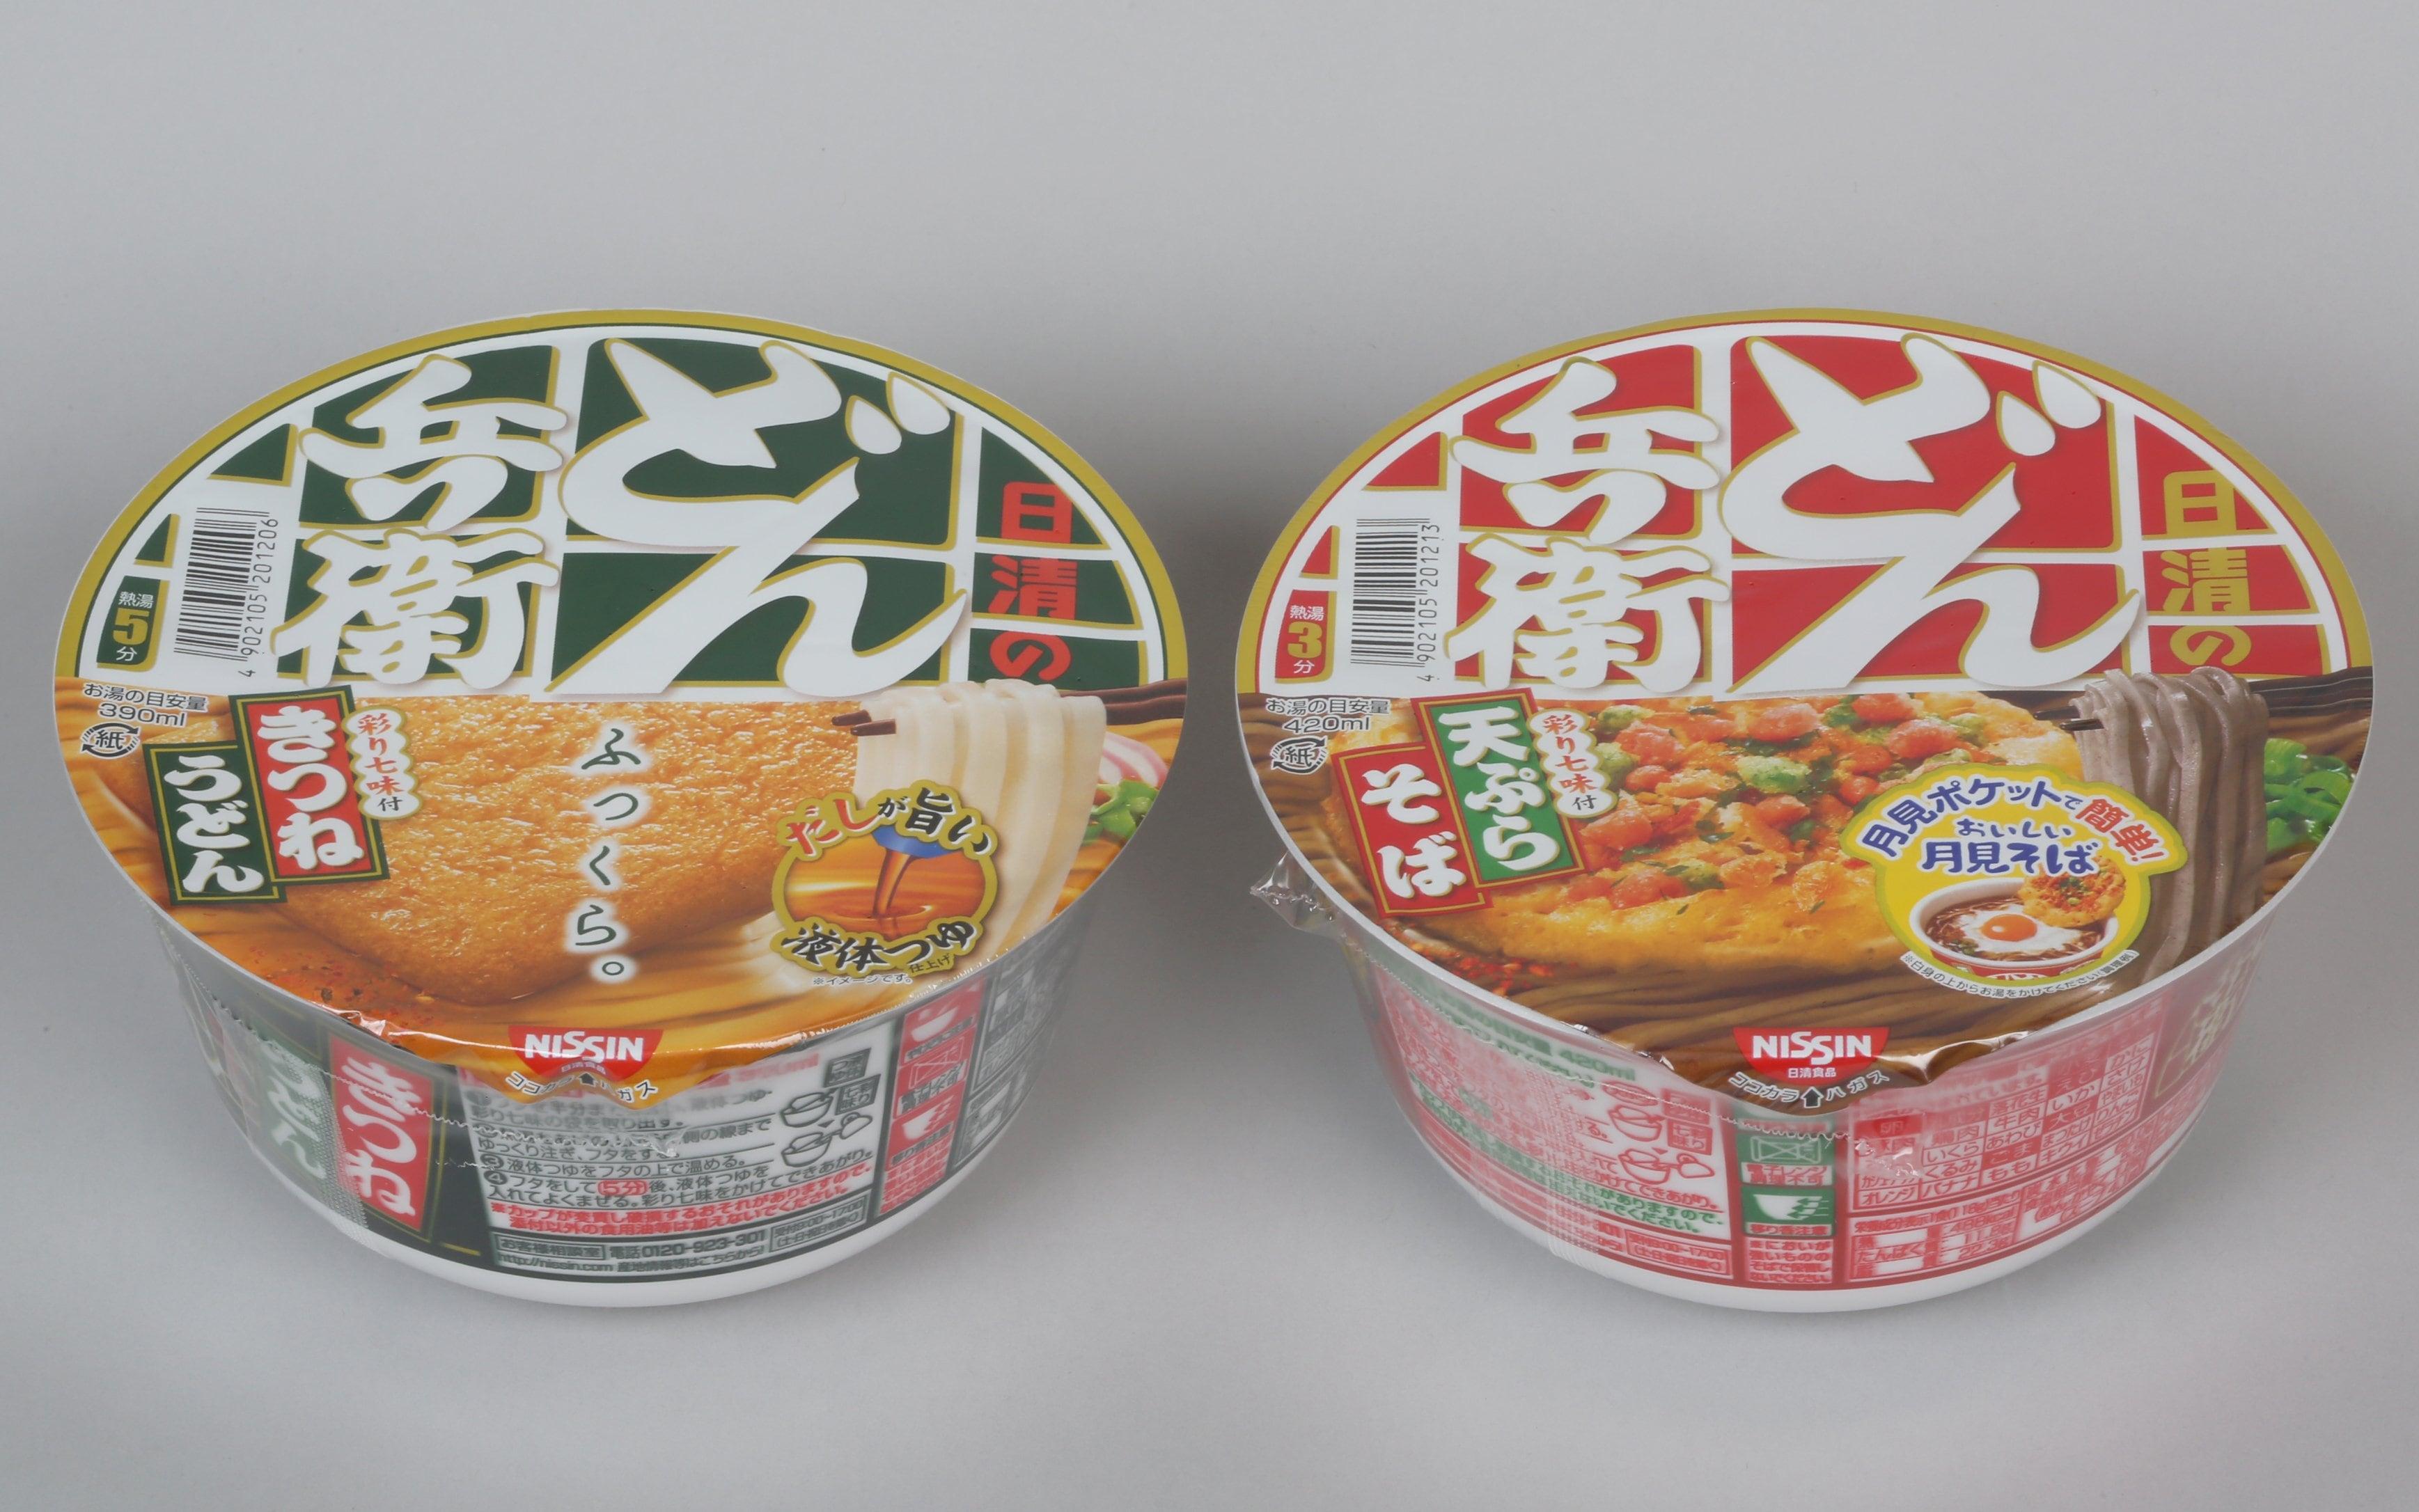 AKB48柏木由紀の推しカップ麺は「ペヤング」と「どん兵衛」の画像002